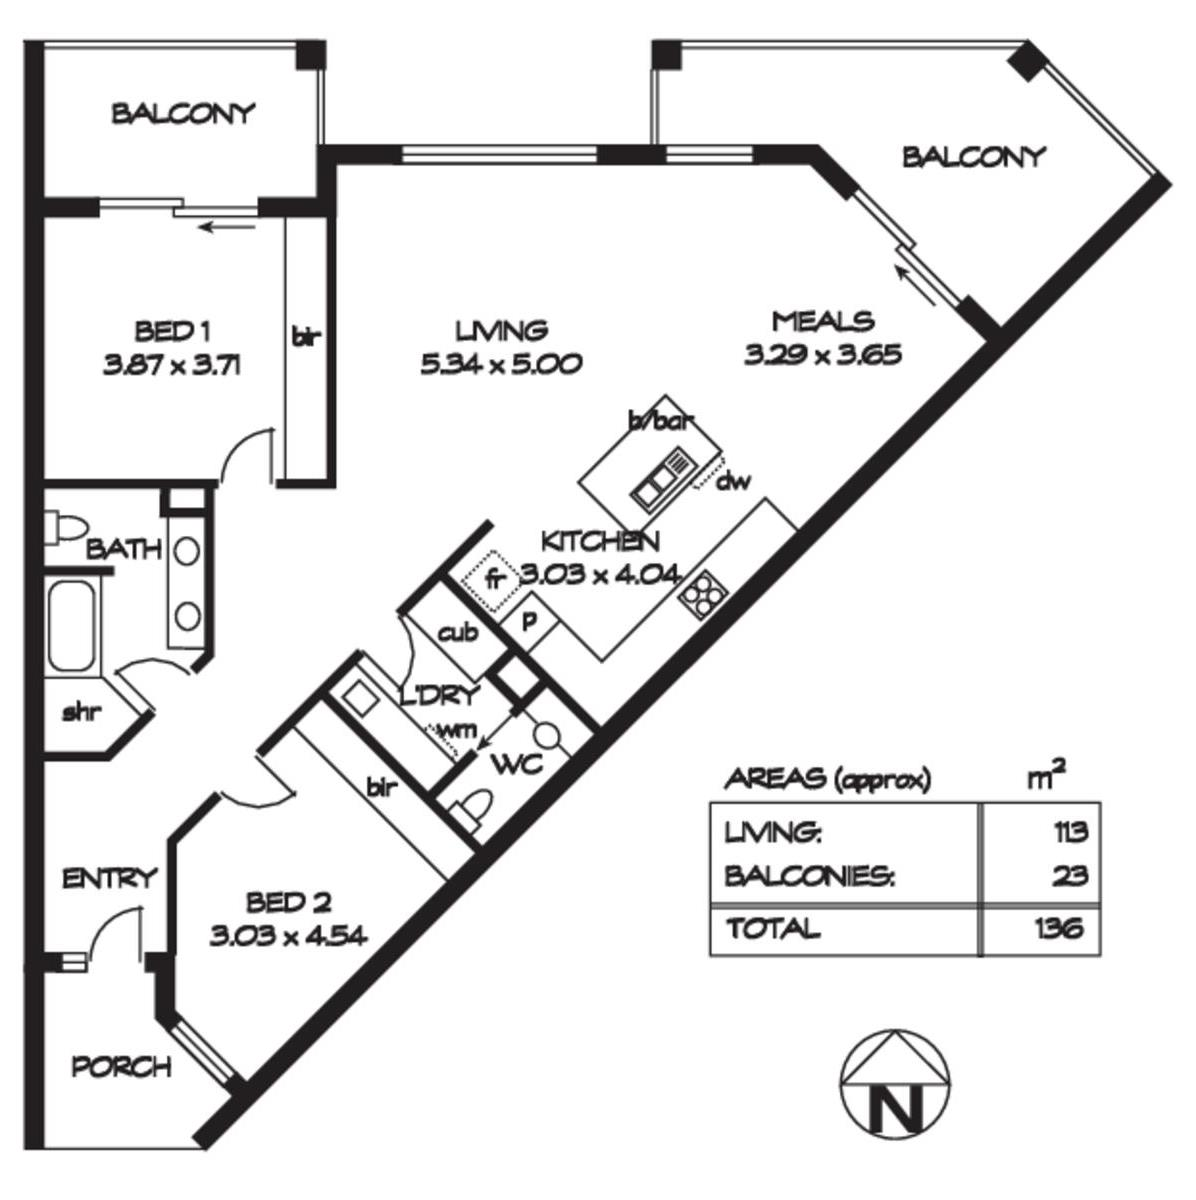 mydimport-1596538639-hires.4026-floorplan1.jpg